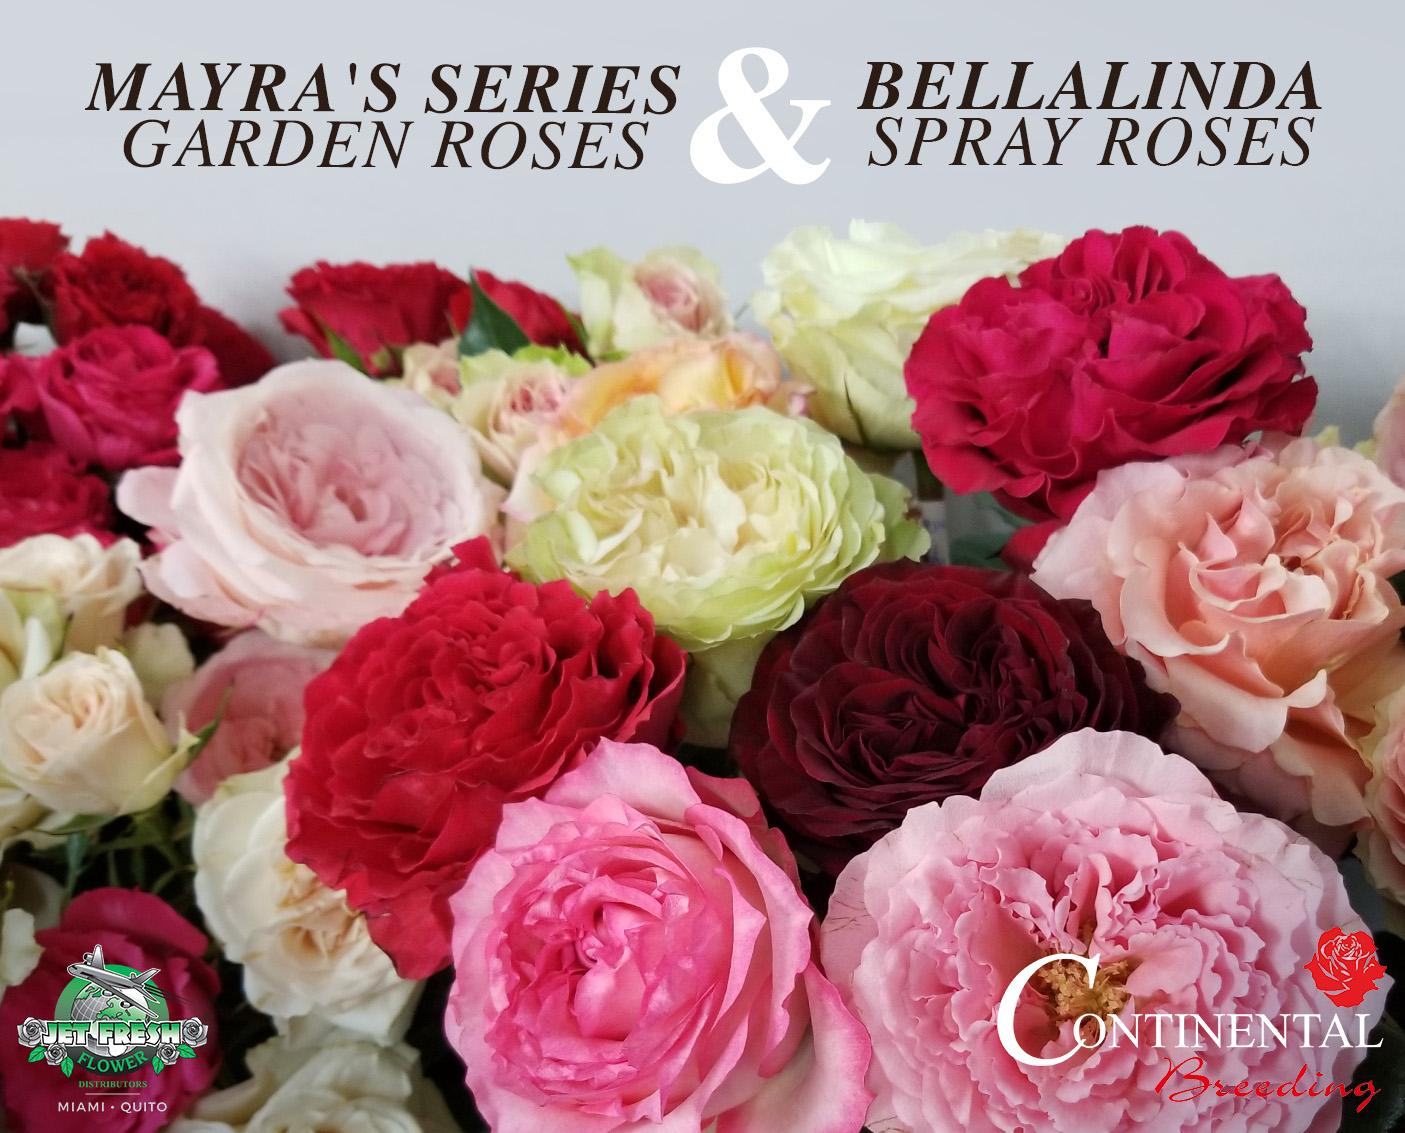 Roses In Garden: Mayra's Series Garden Roses And Bellalinda Spray Roses